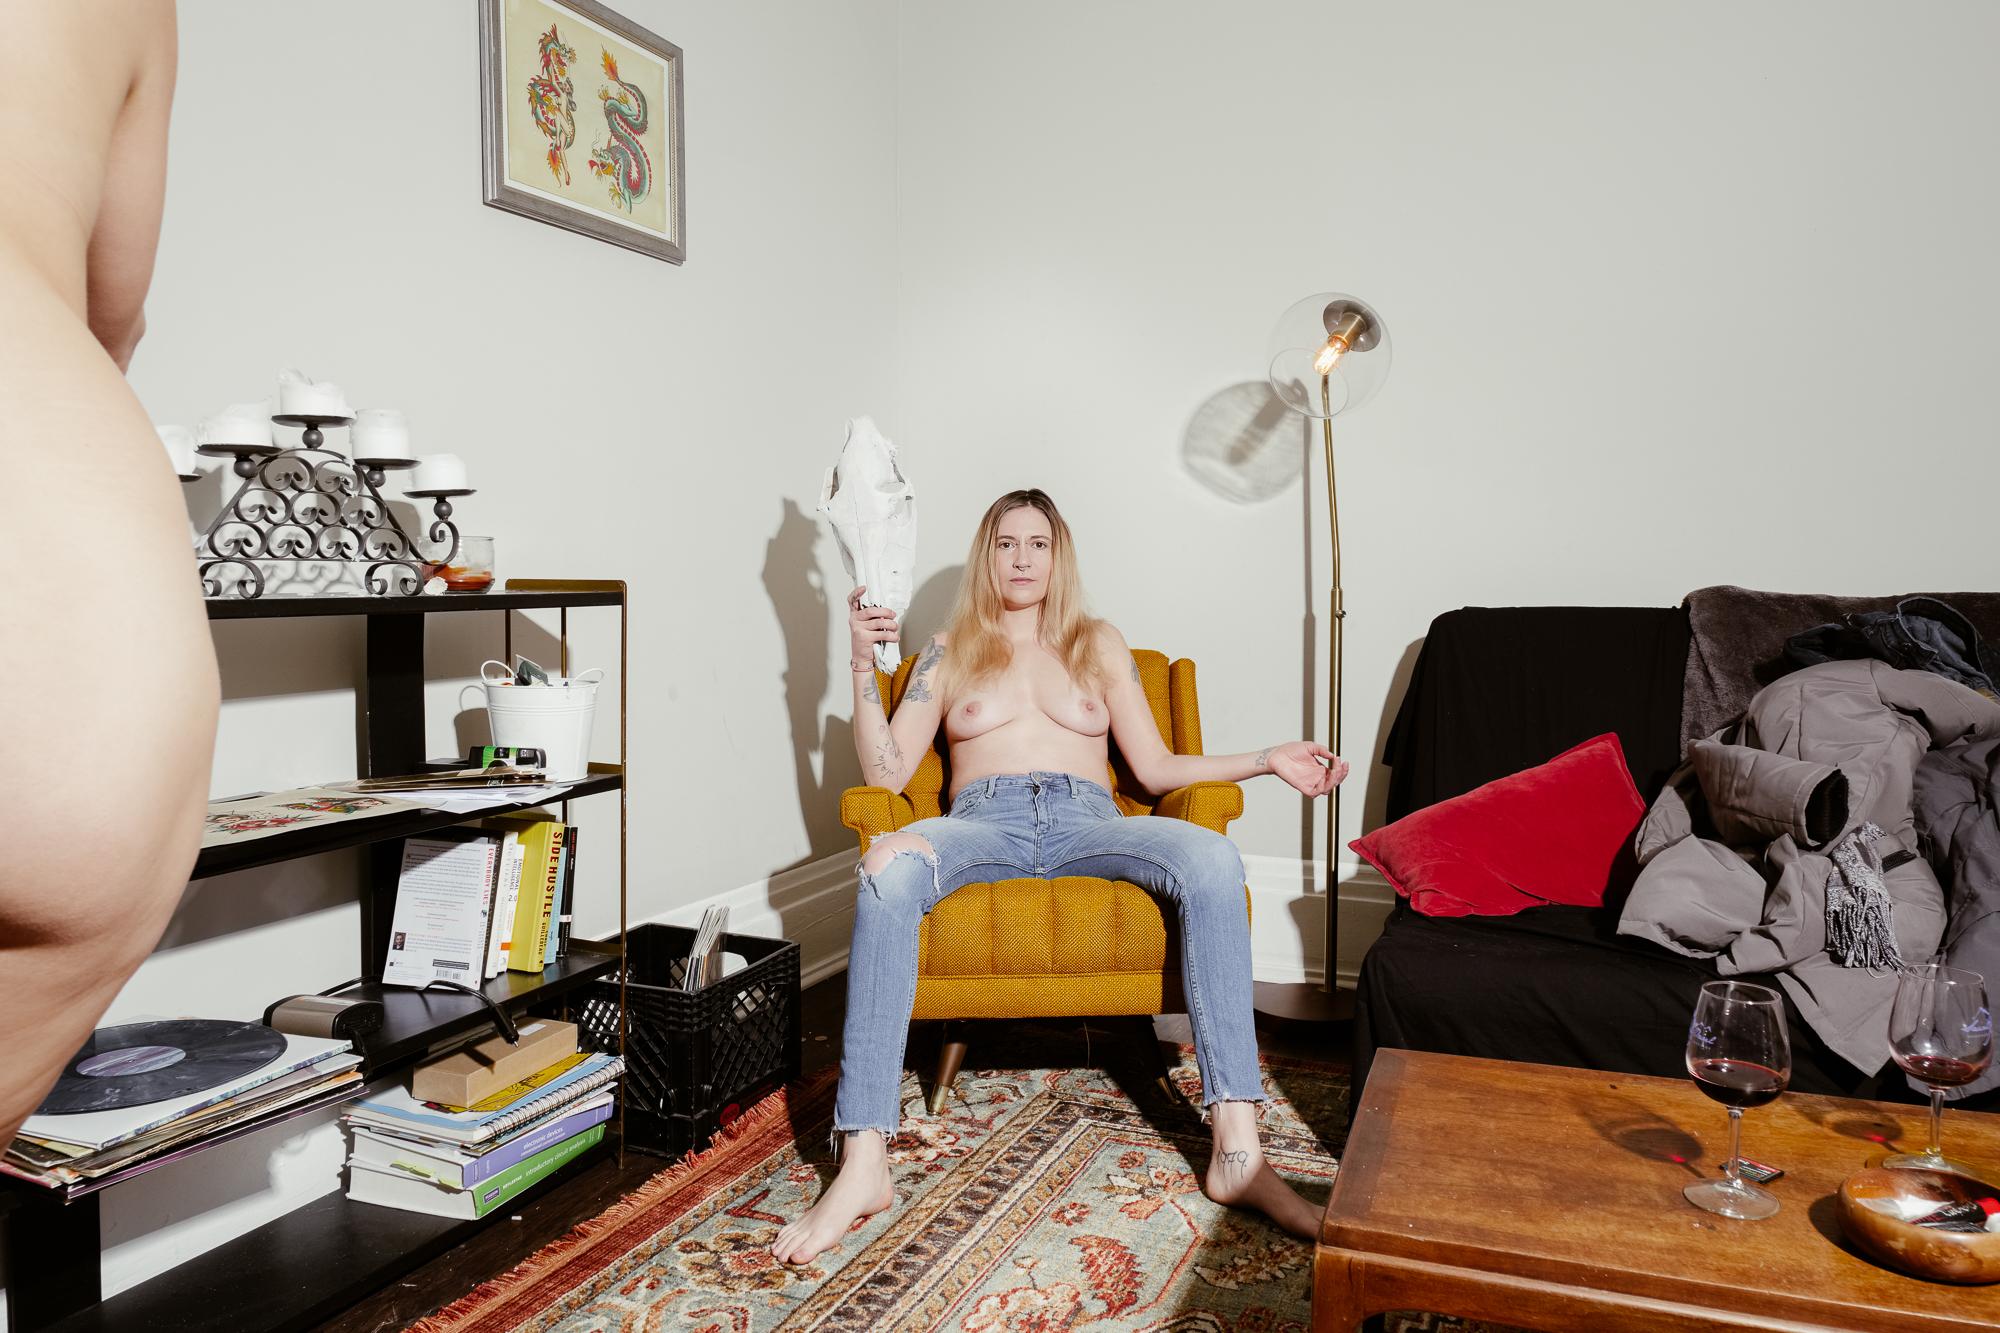 20181128-Brandi-Hannah-apartment-X-T2-0143-Edit.jpg